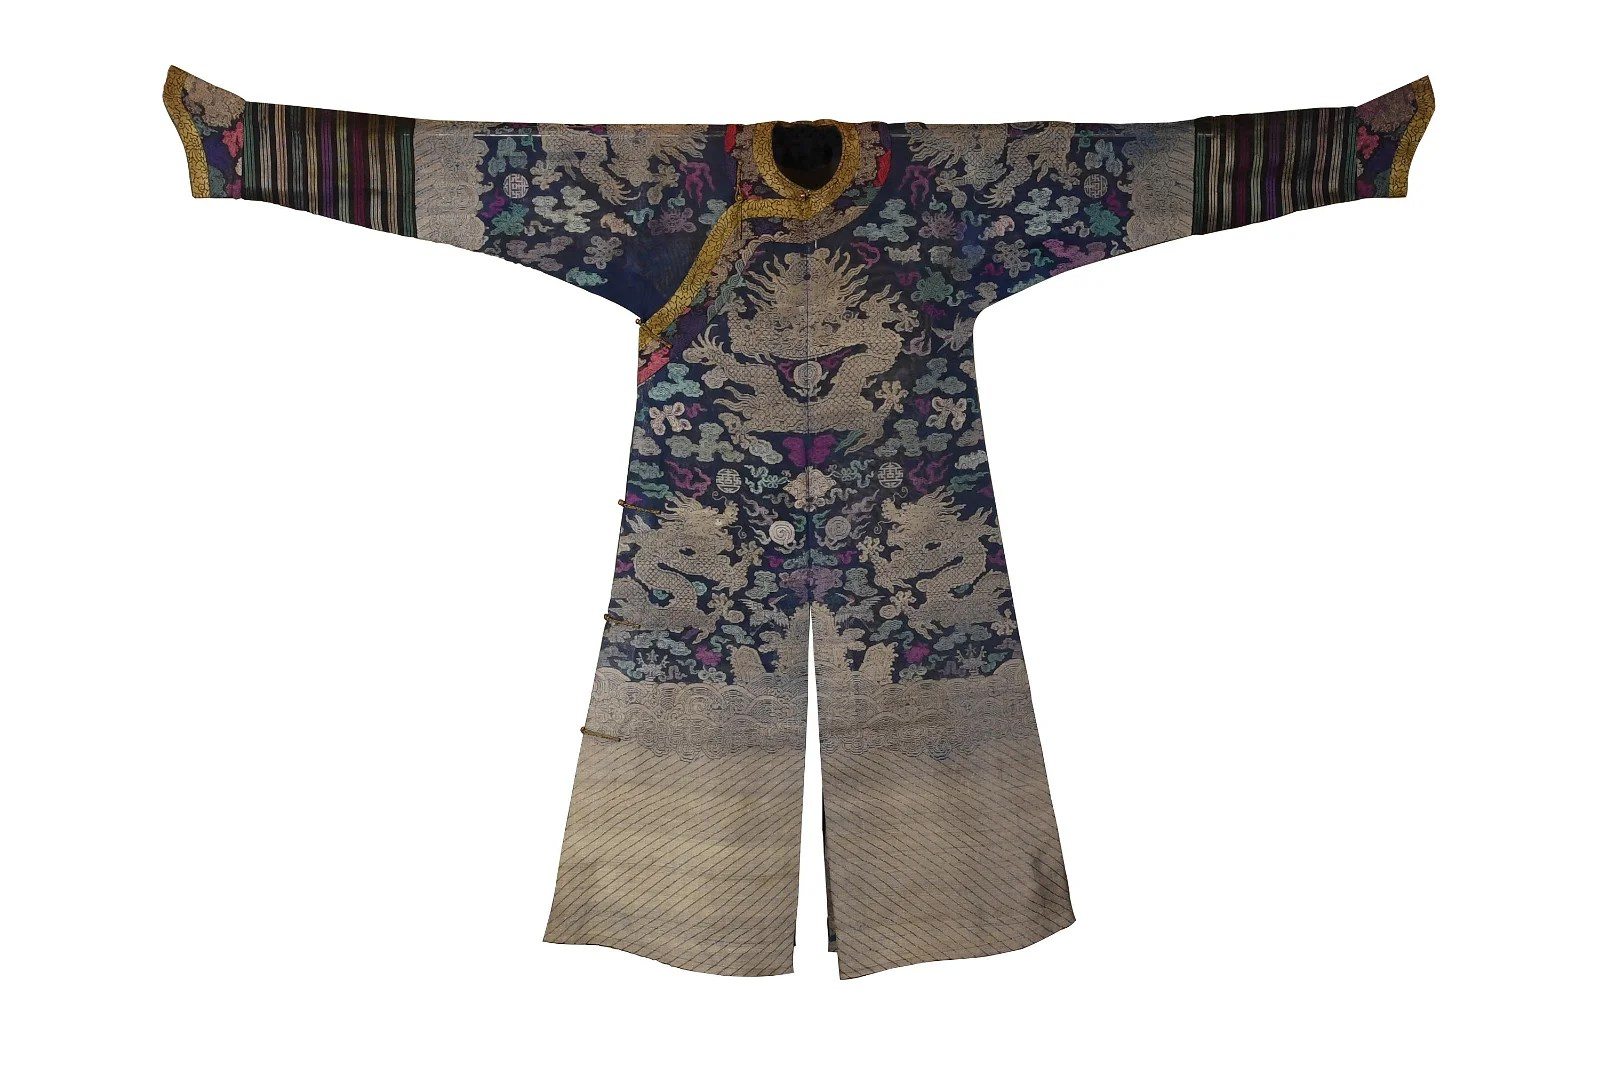 Chinese Blue Summer Dragon Robe, 19th Century